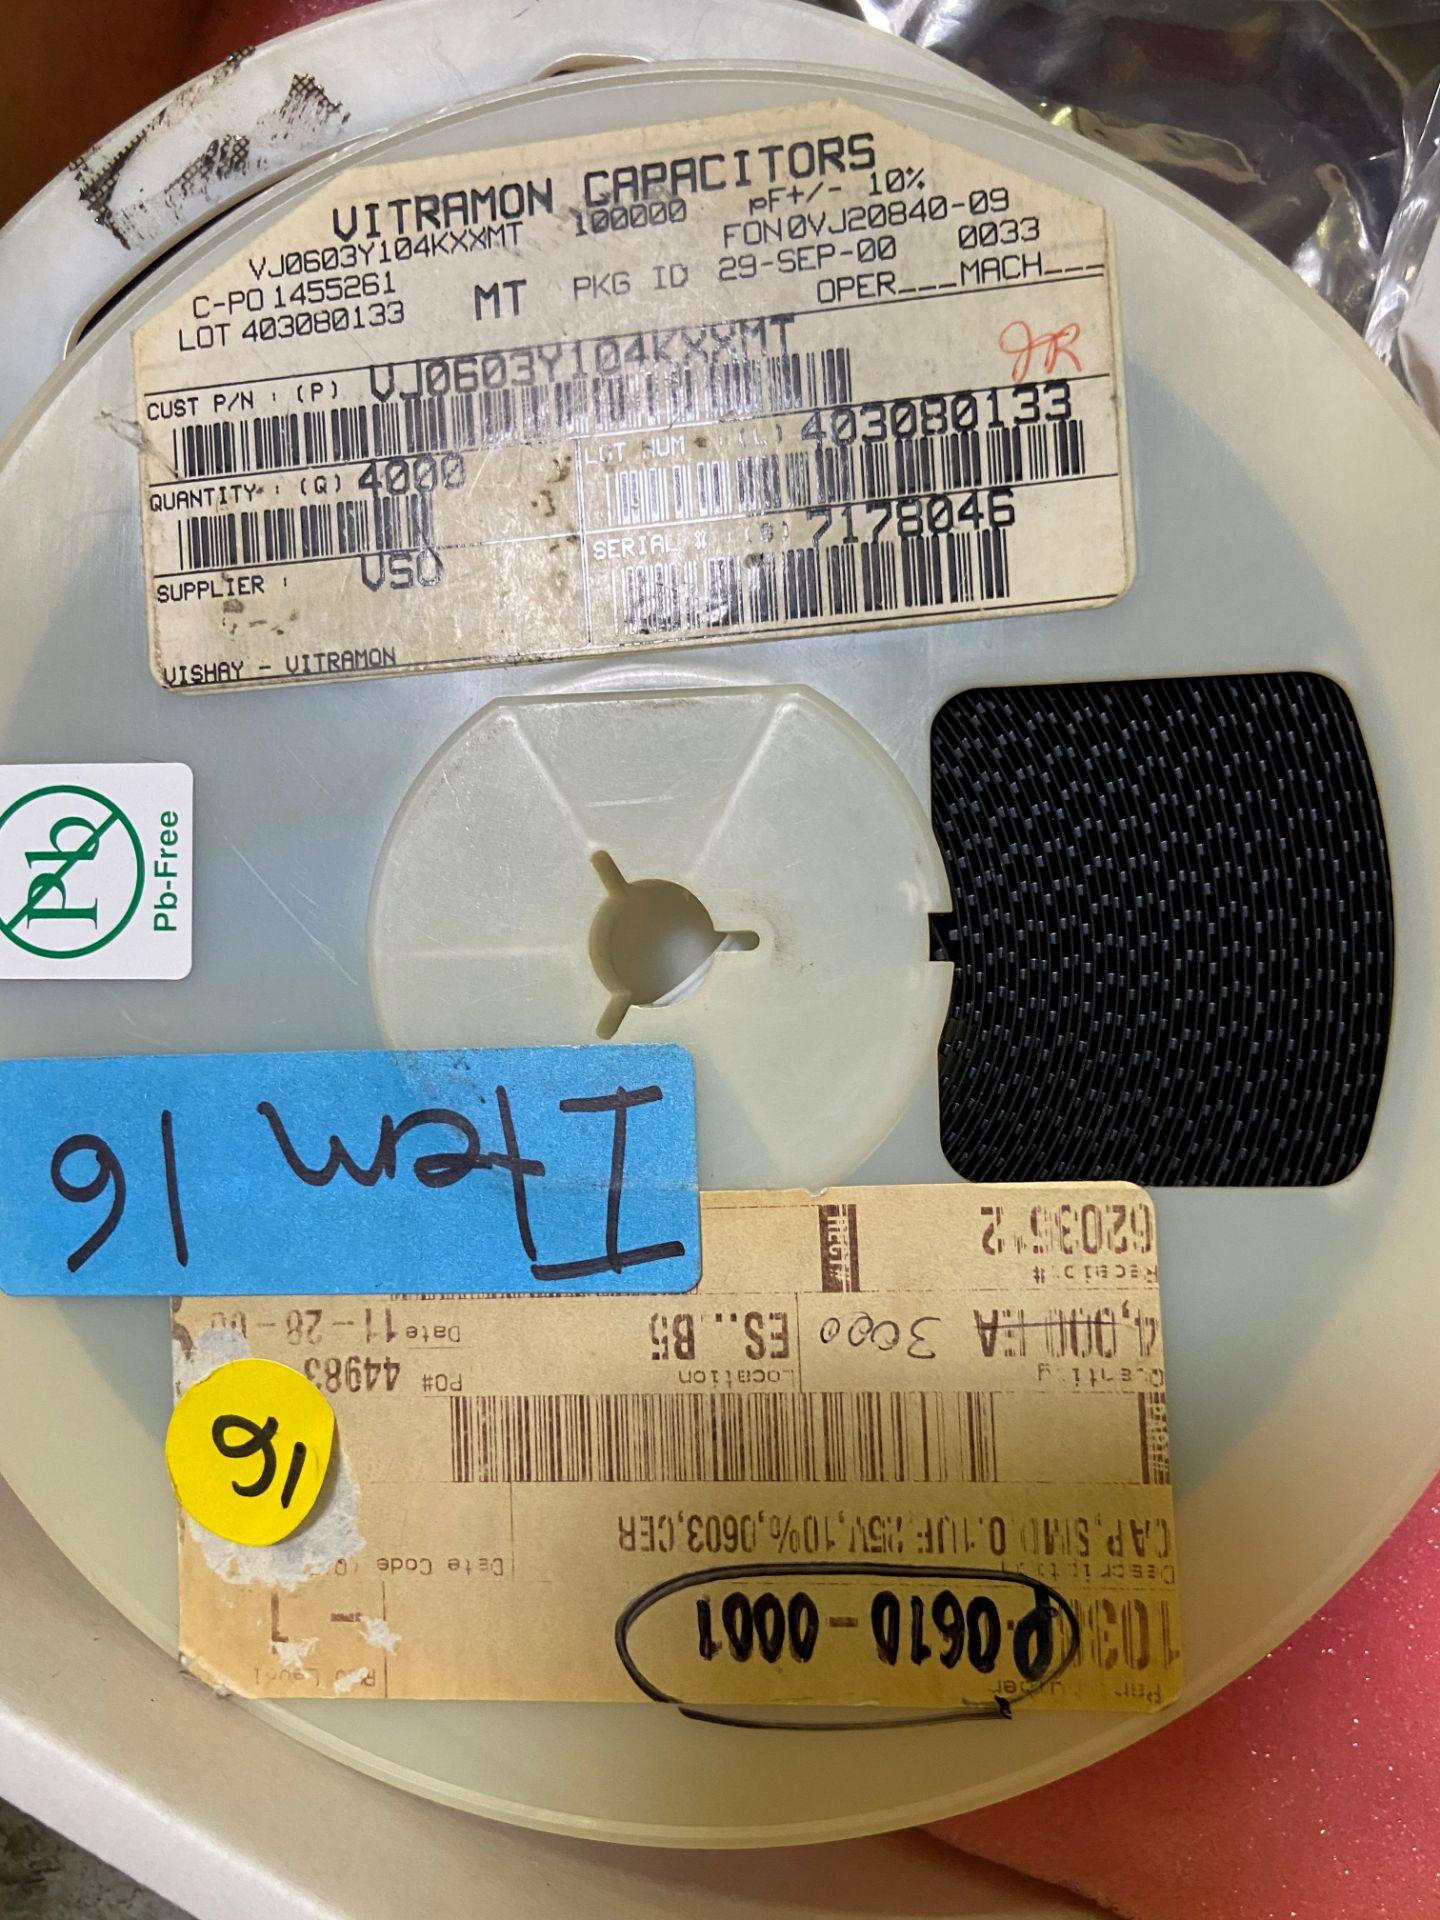 Vishay VJ0603Y104KXXMT, Cap Ceramic 0.1uF 25V X7R 10% Pad SMD 0603 150°C Automotive T/R, APROX QTY - Image 4 of 15